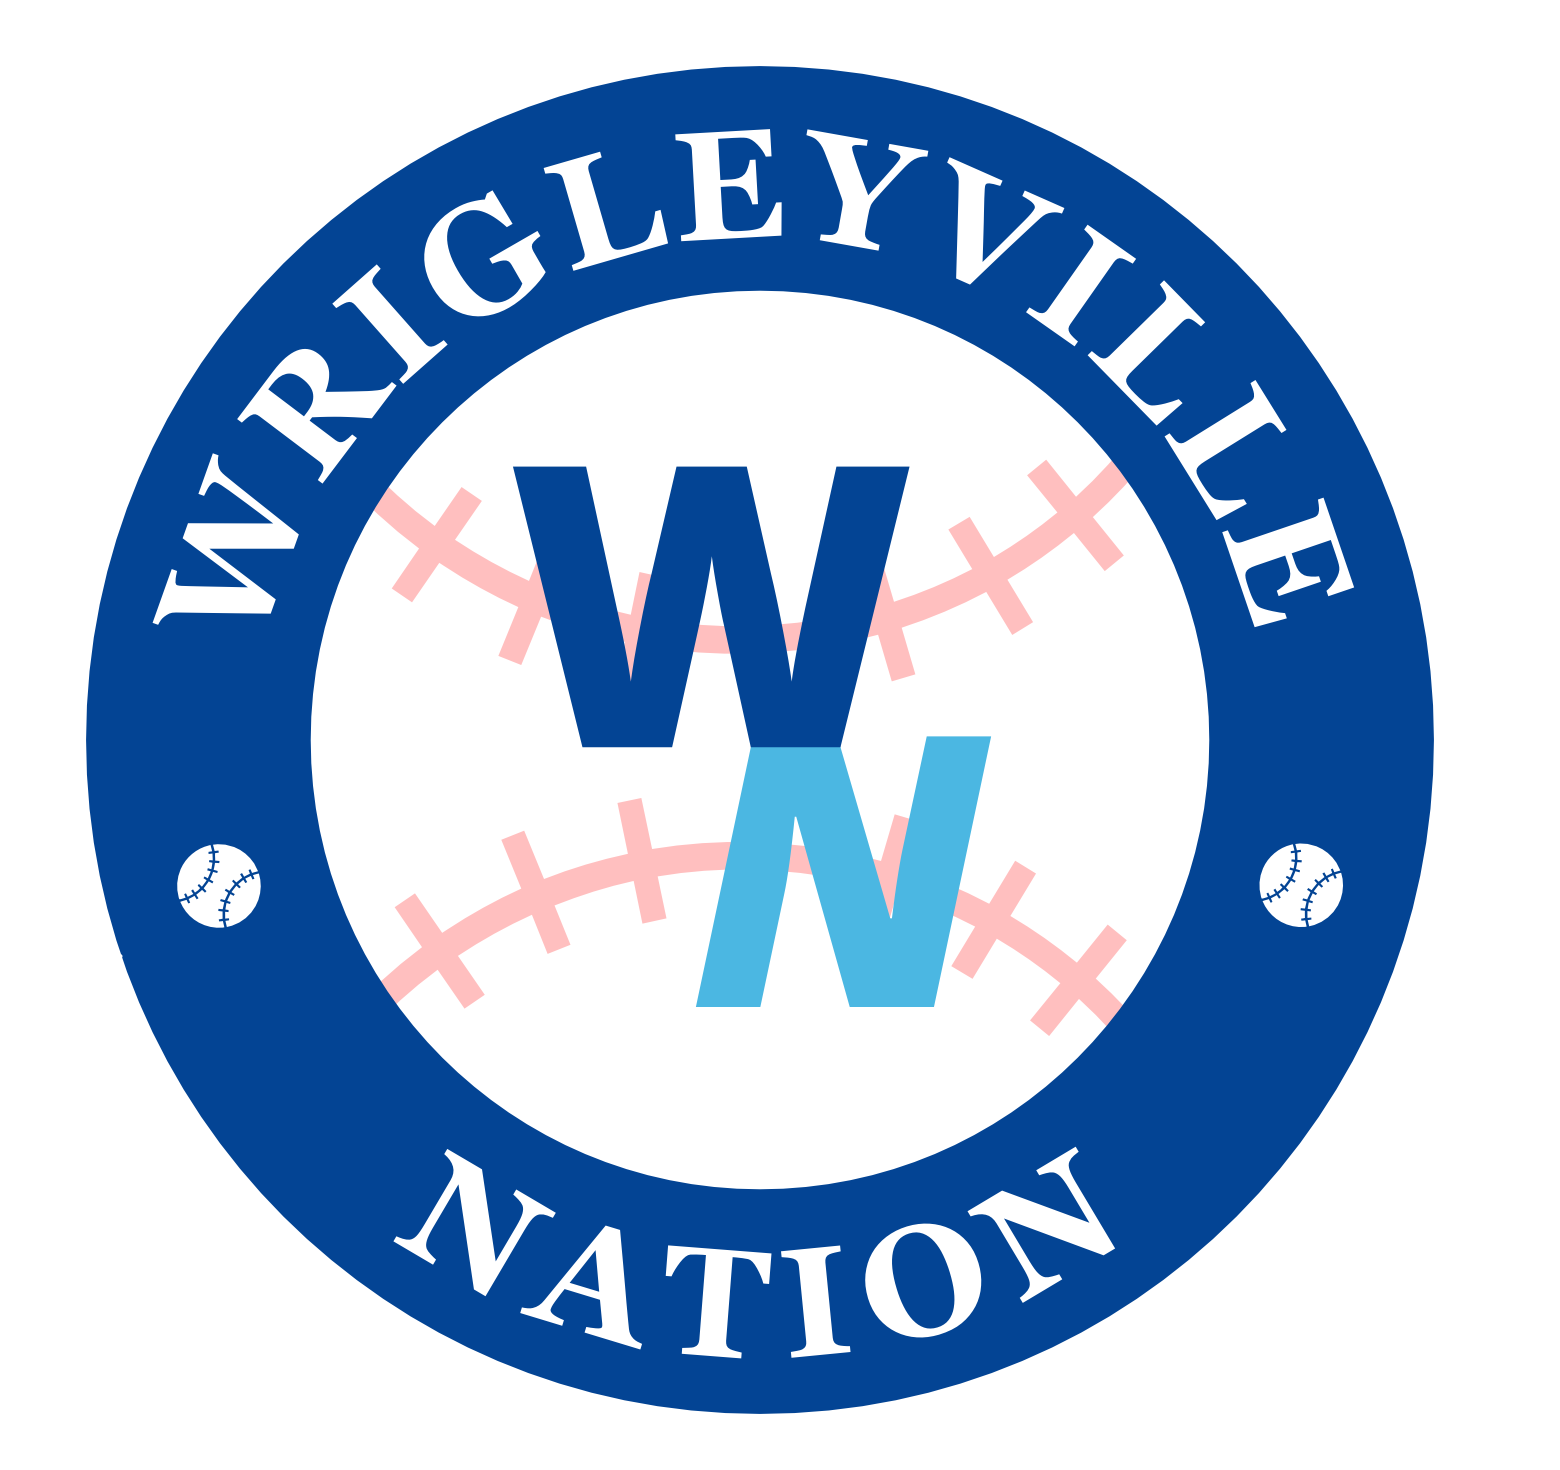 Wrigleyville Nation Ep 237 - Guest: Matthew Trueblood, Celebrating Theo Epstein, Looking Ahead show art